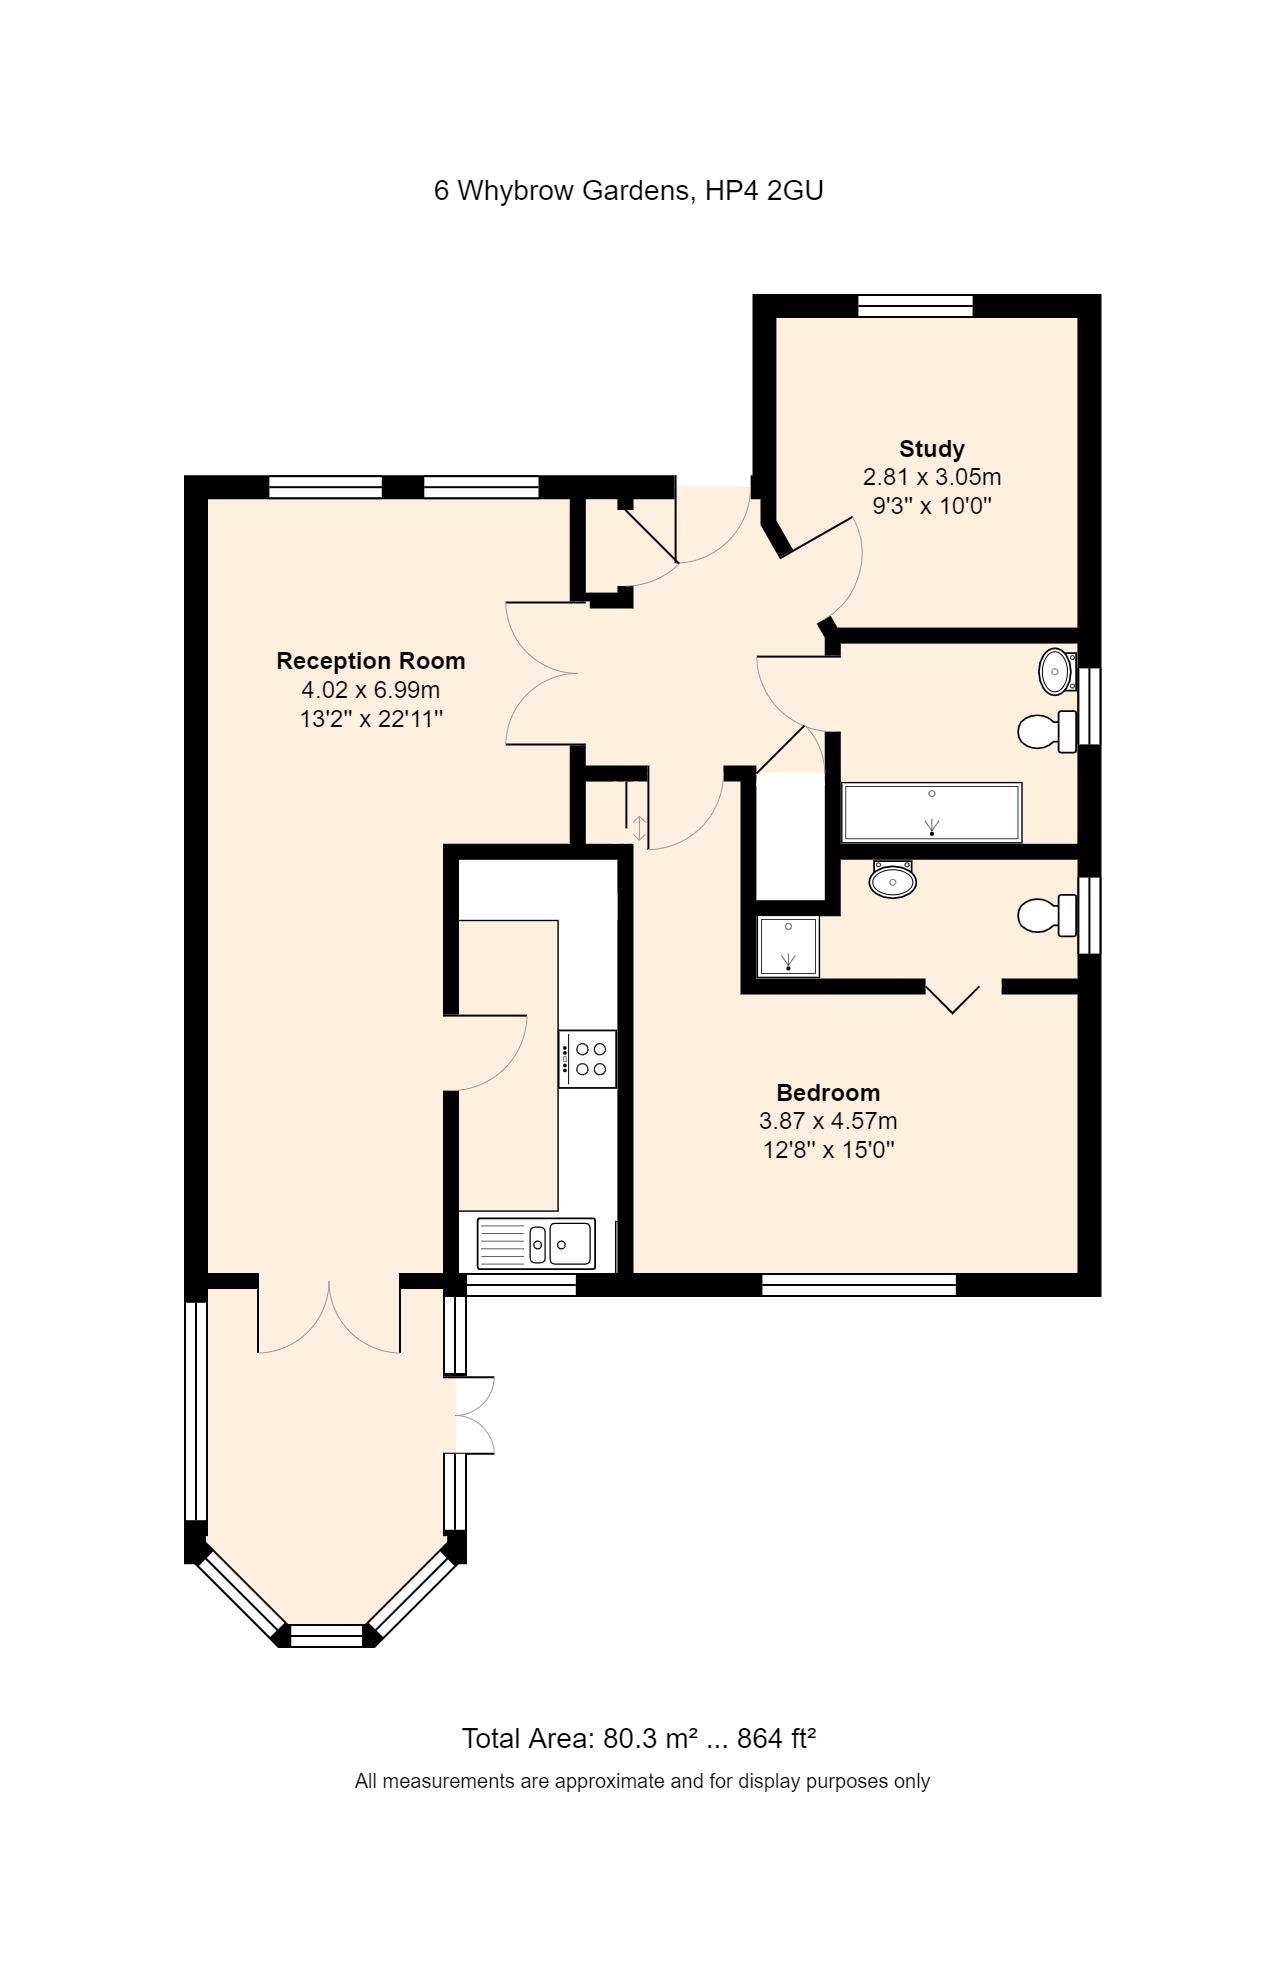 6 Whybrow Gardens Floorplan